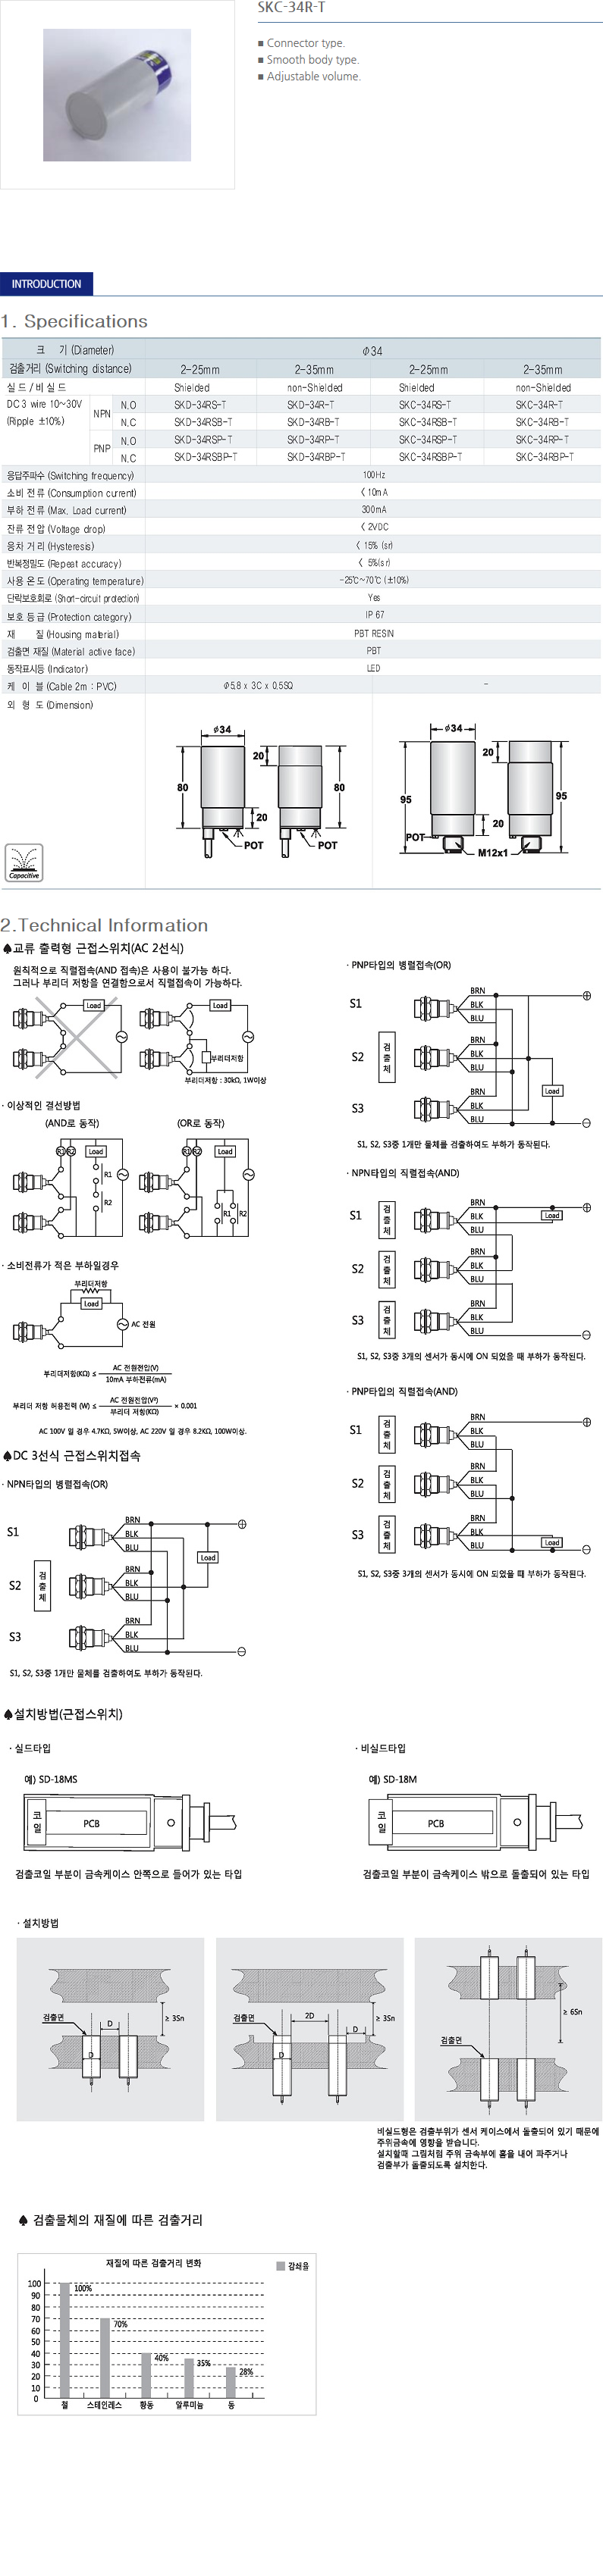 SANIL DC Capacitance Type Proximity Sensor